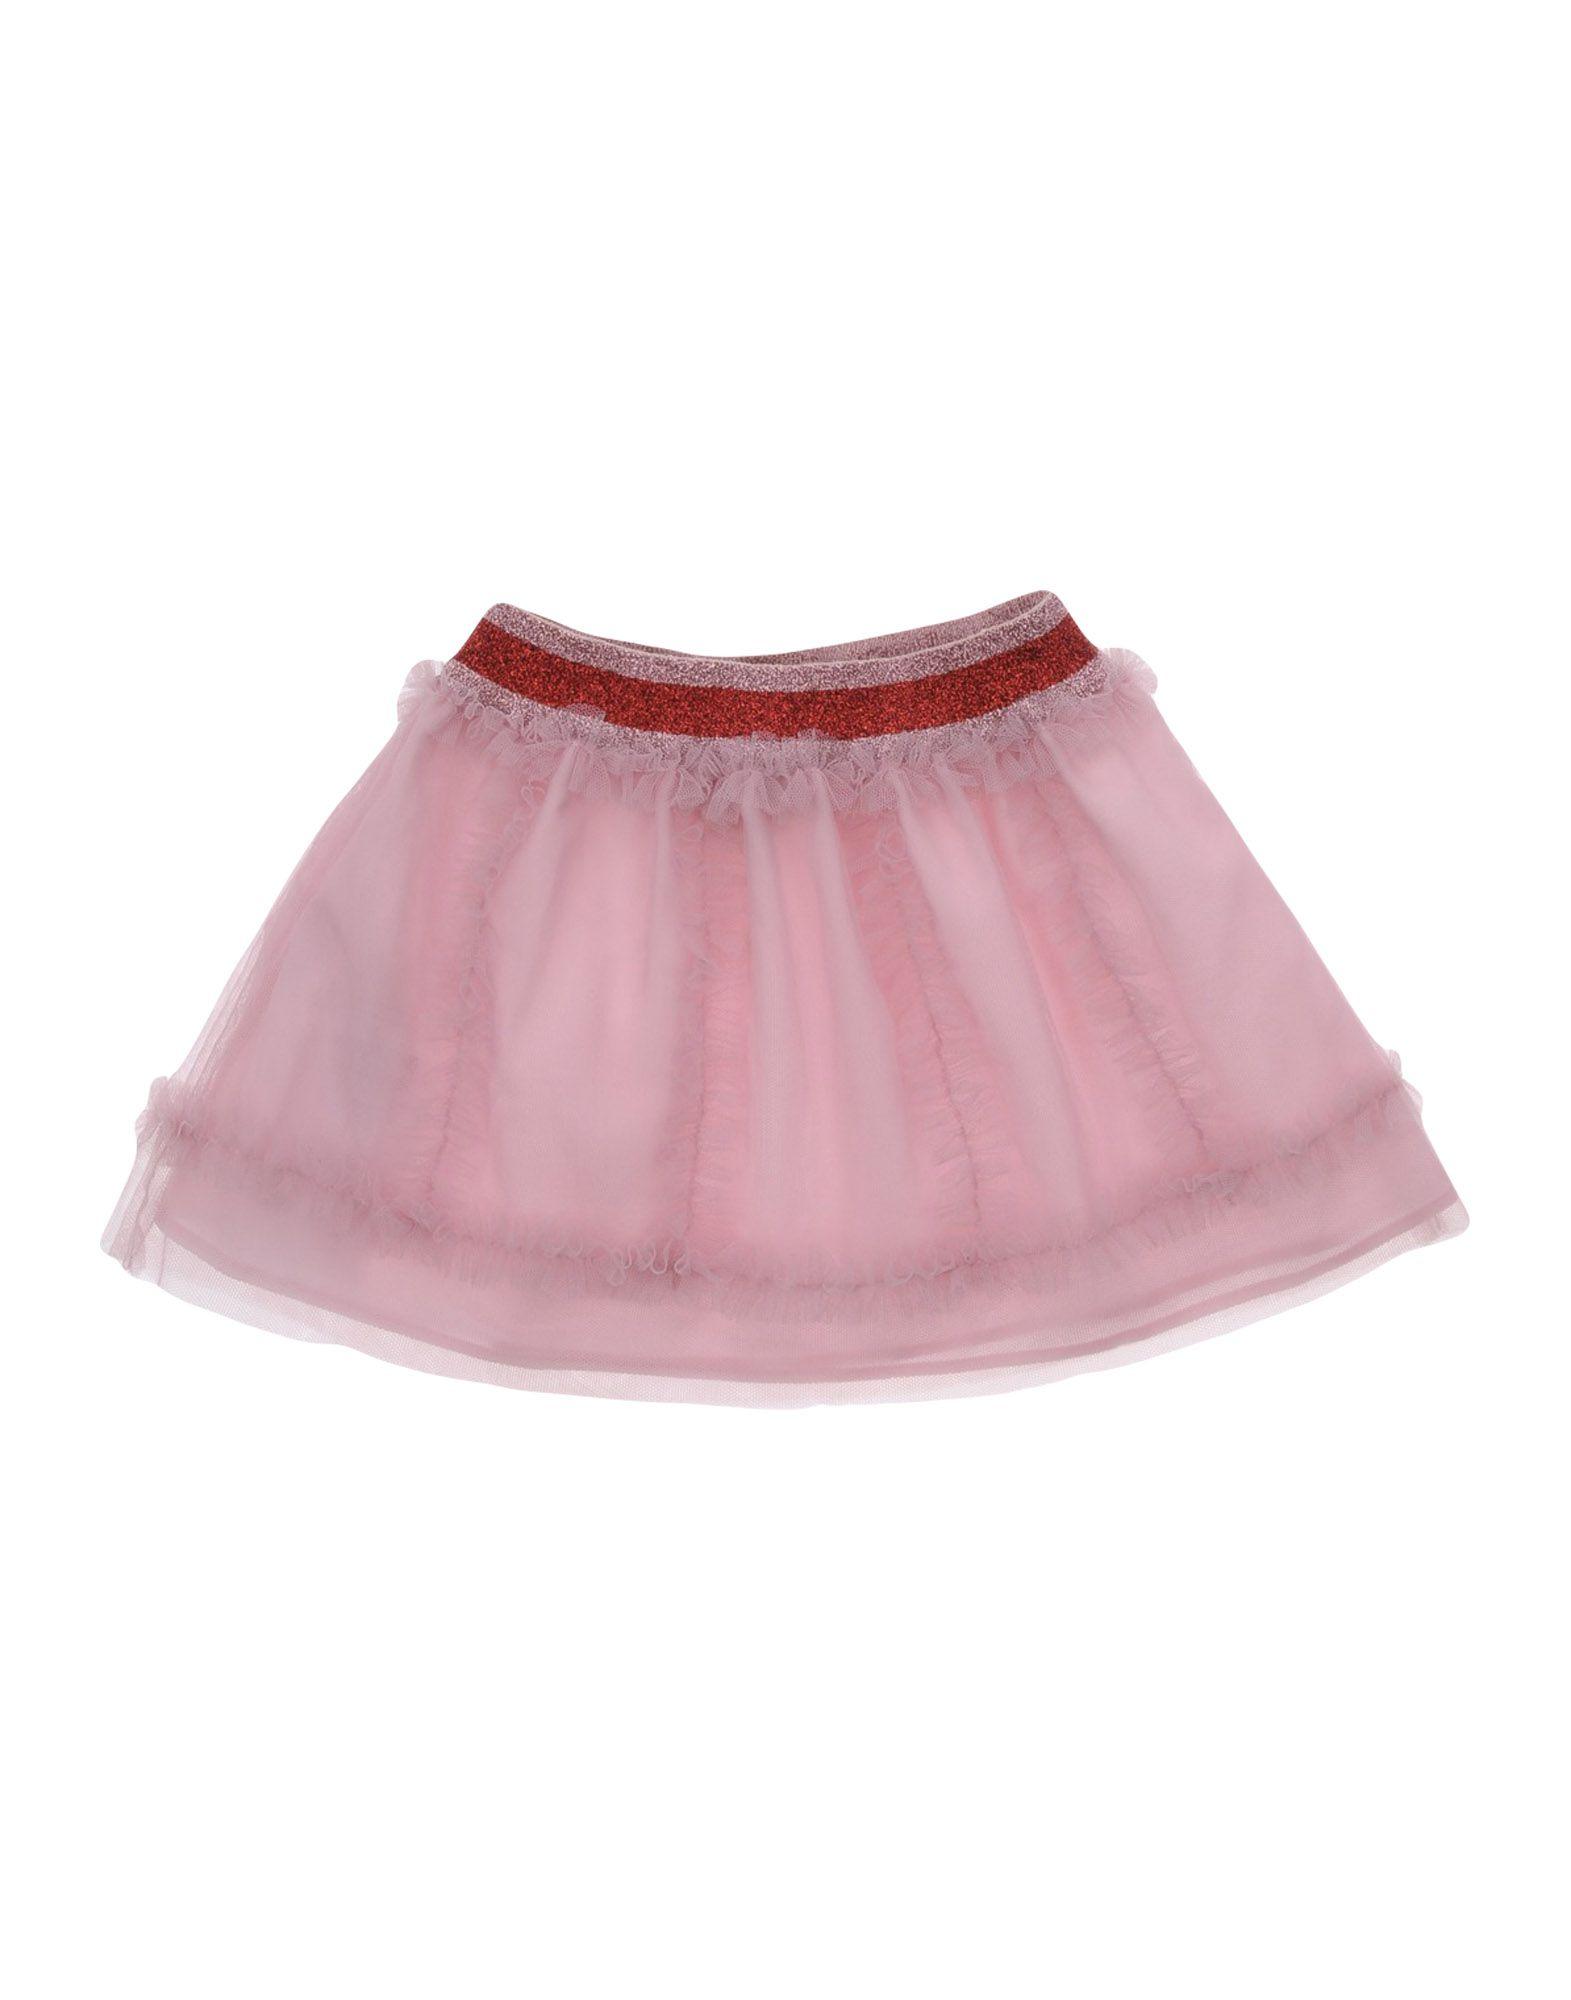 GUCCI | GUCCI Skirts 35376043 | Goxip